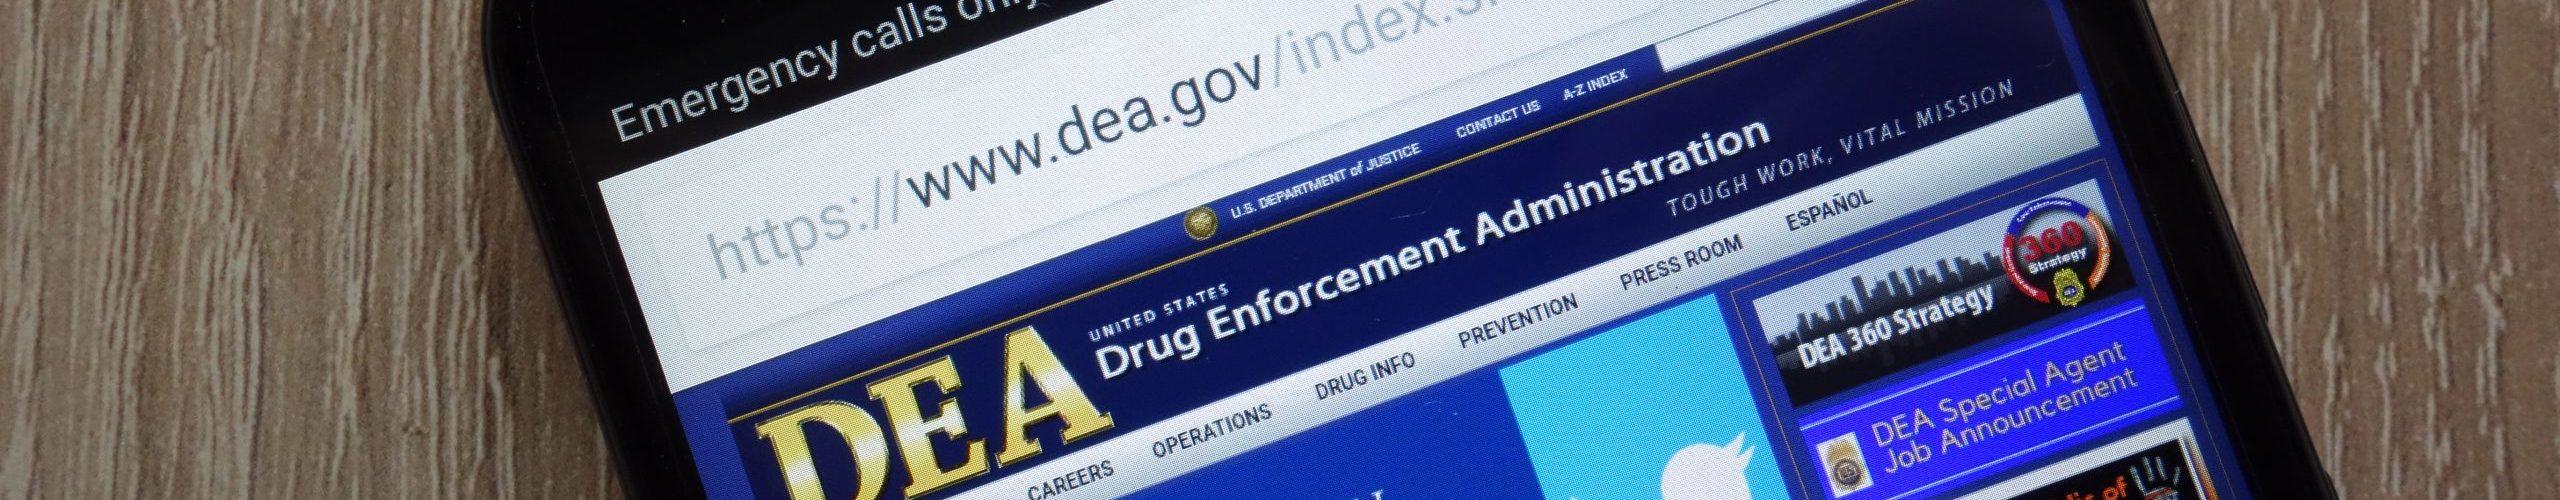 cbd controlled substances act